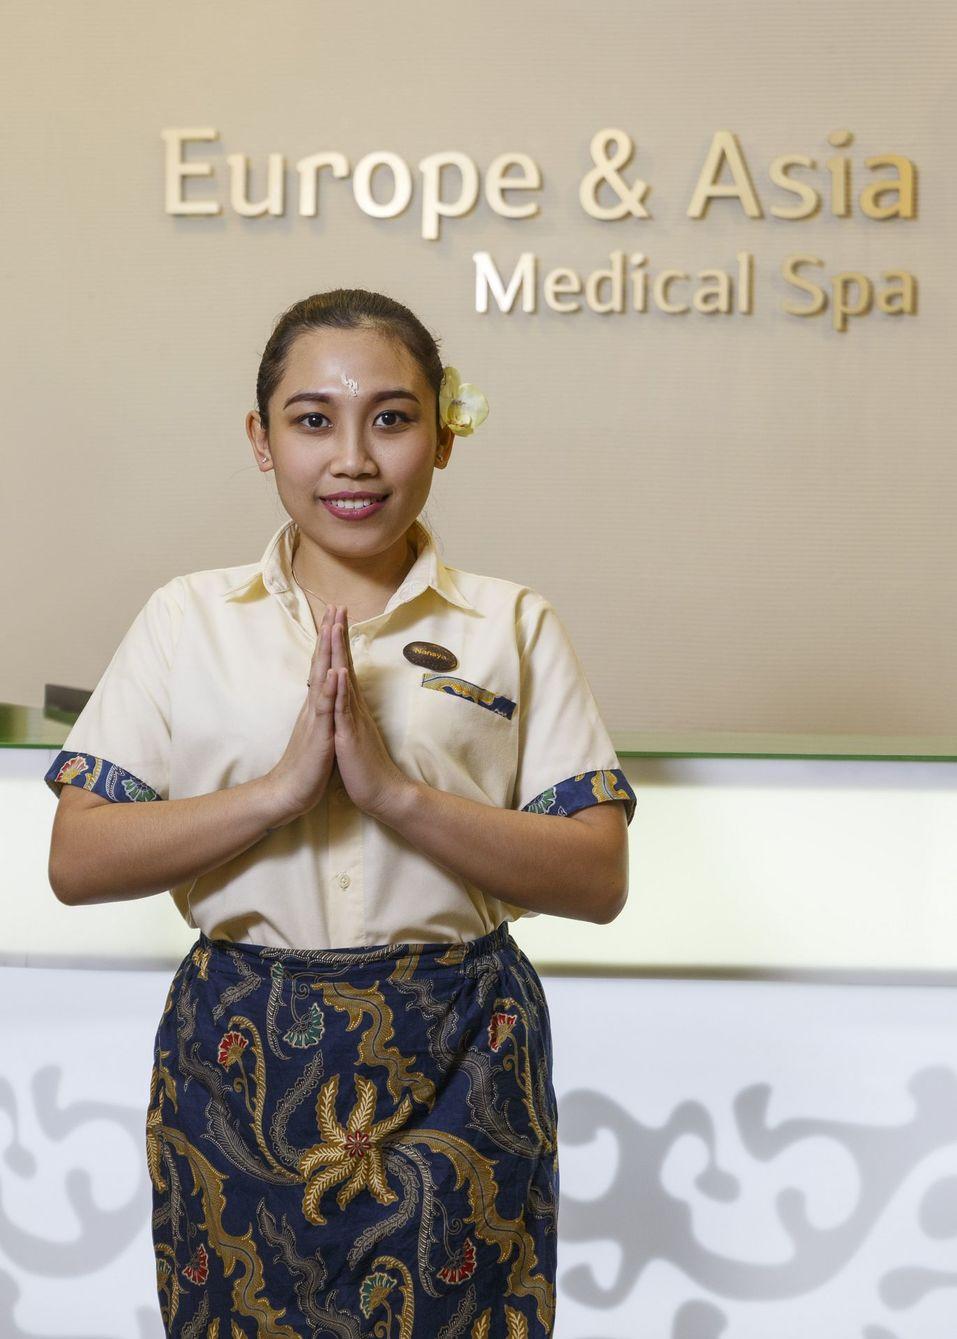 Балийский мастер Медикал СПА «Европа-Азия»